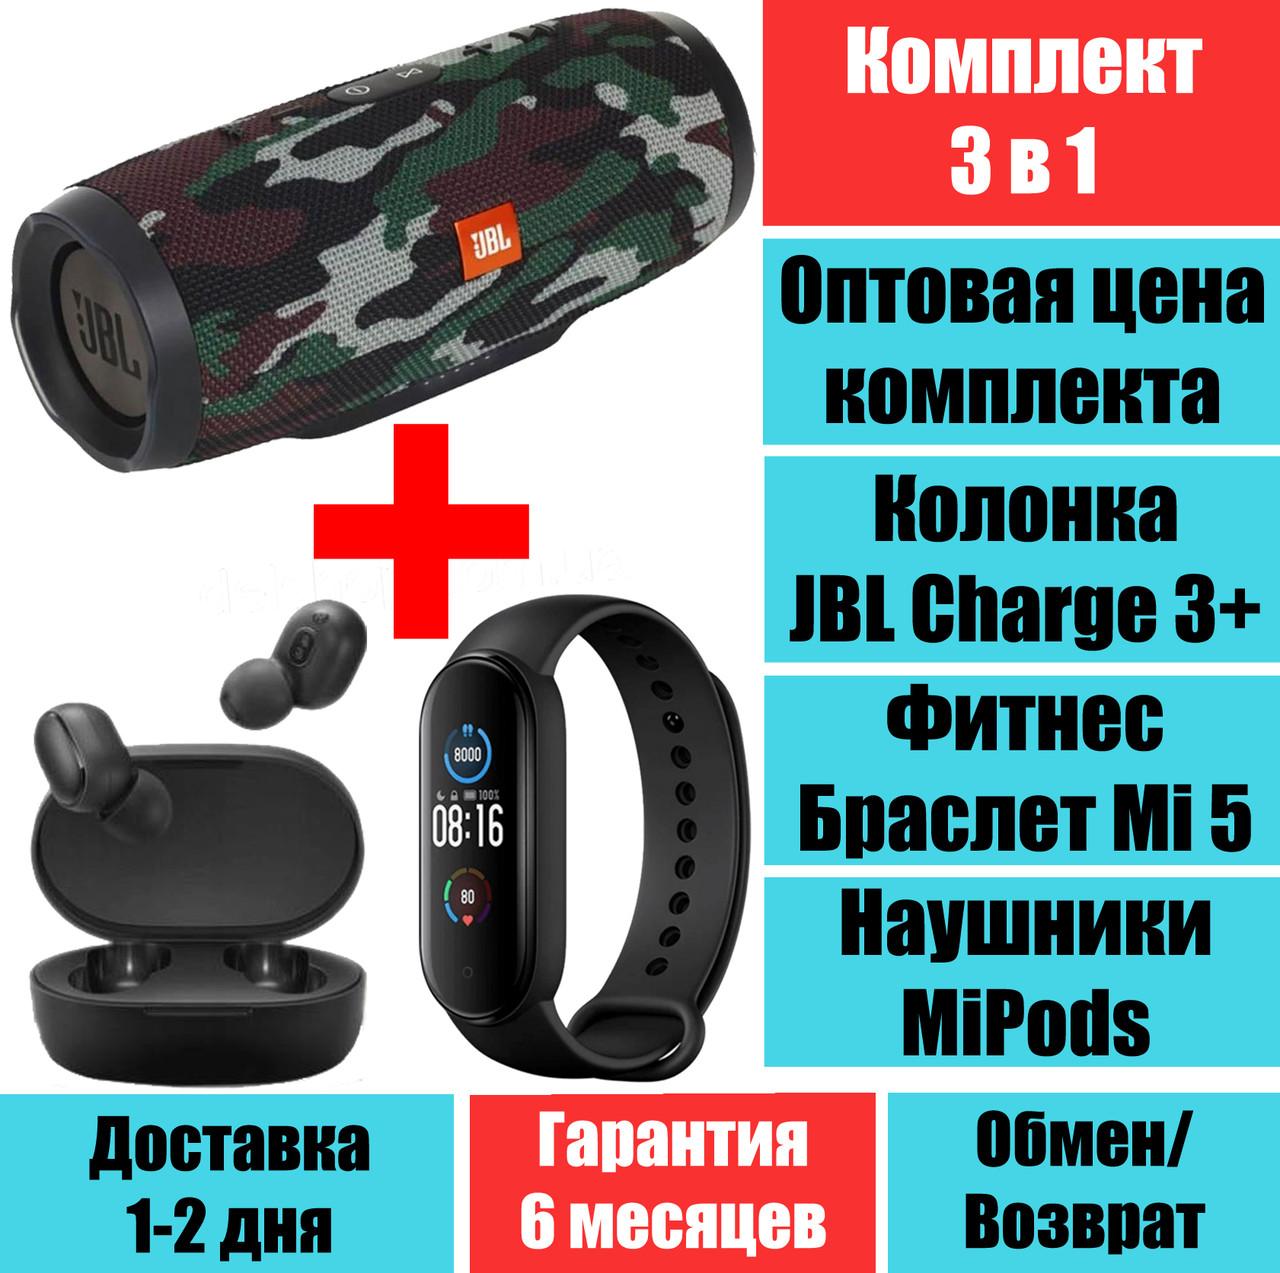 Колонка JBL Charge 3+, Смарт браслет Mi5 band, наушники Xiaomi MiPods A6s QualitiReplica Комплект